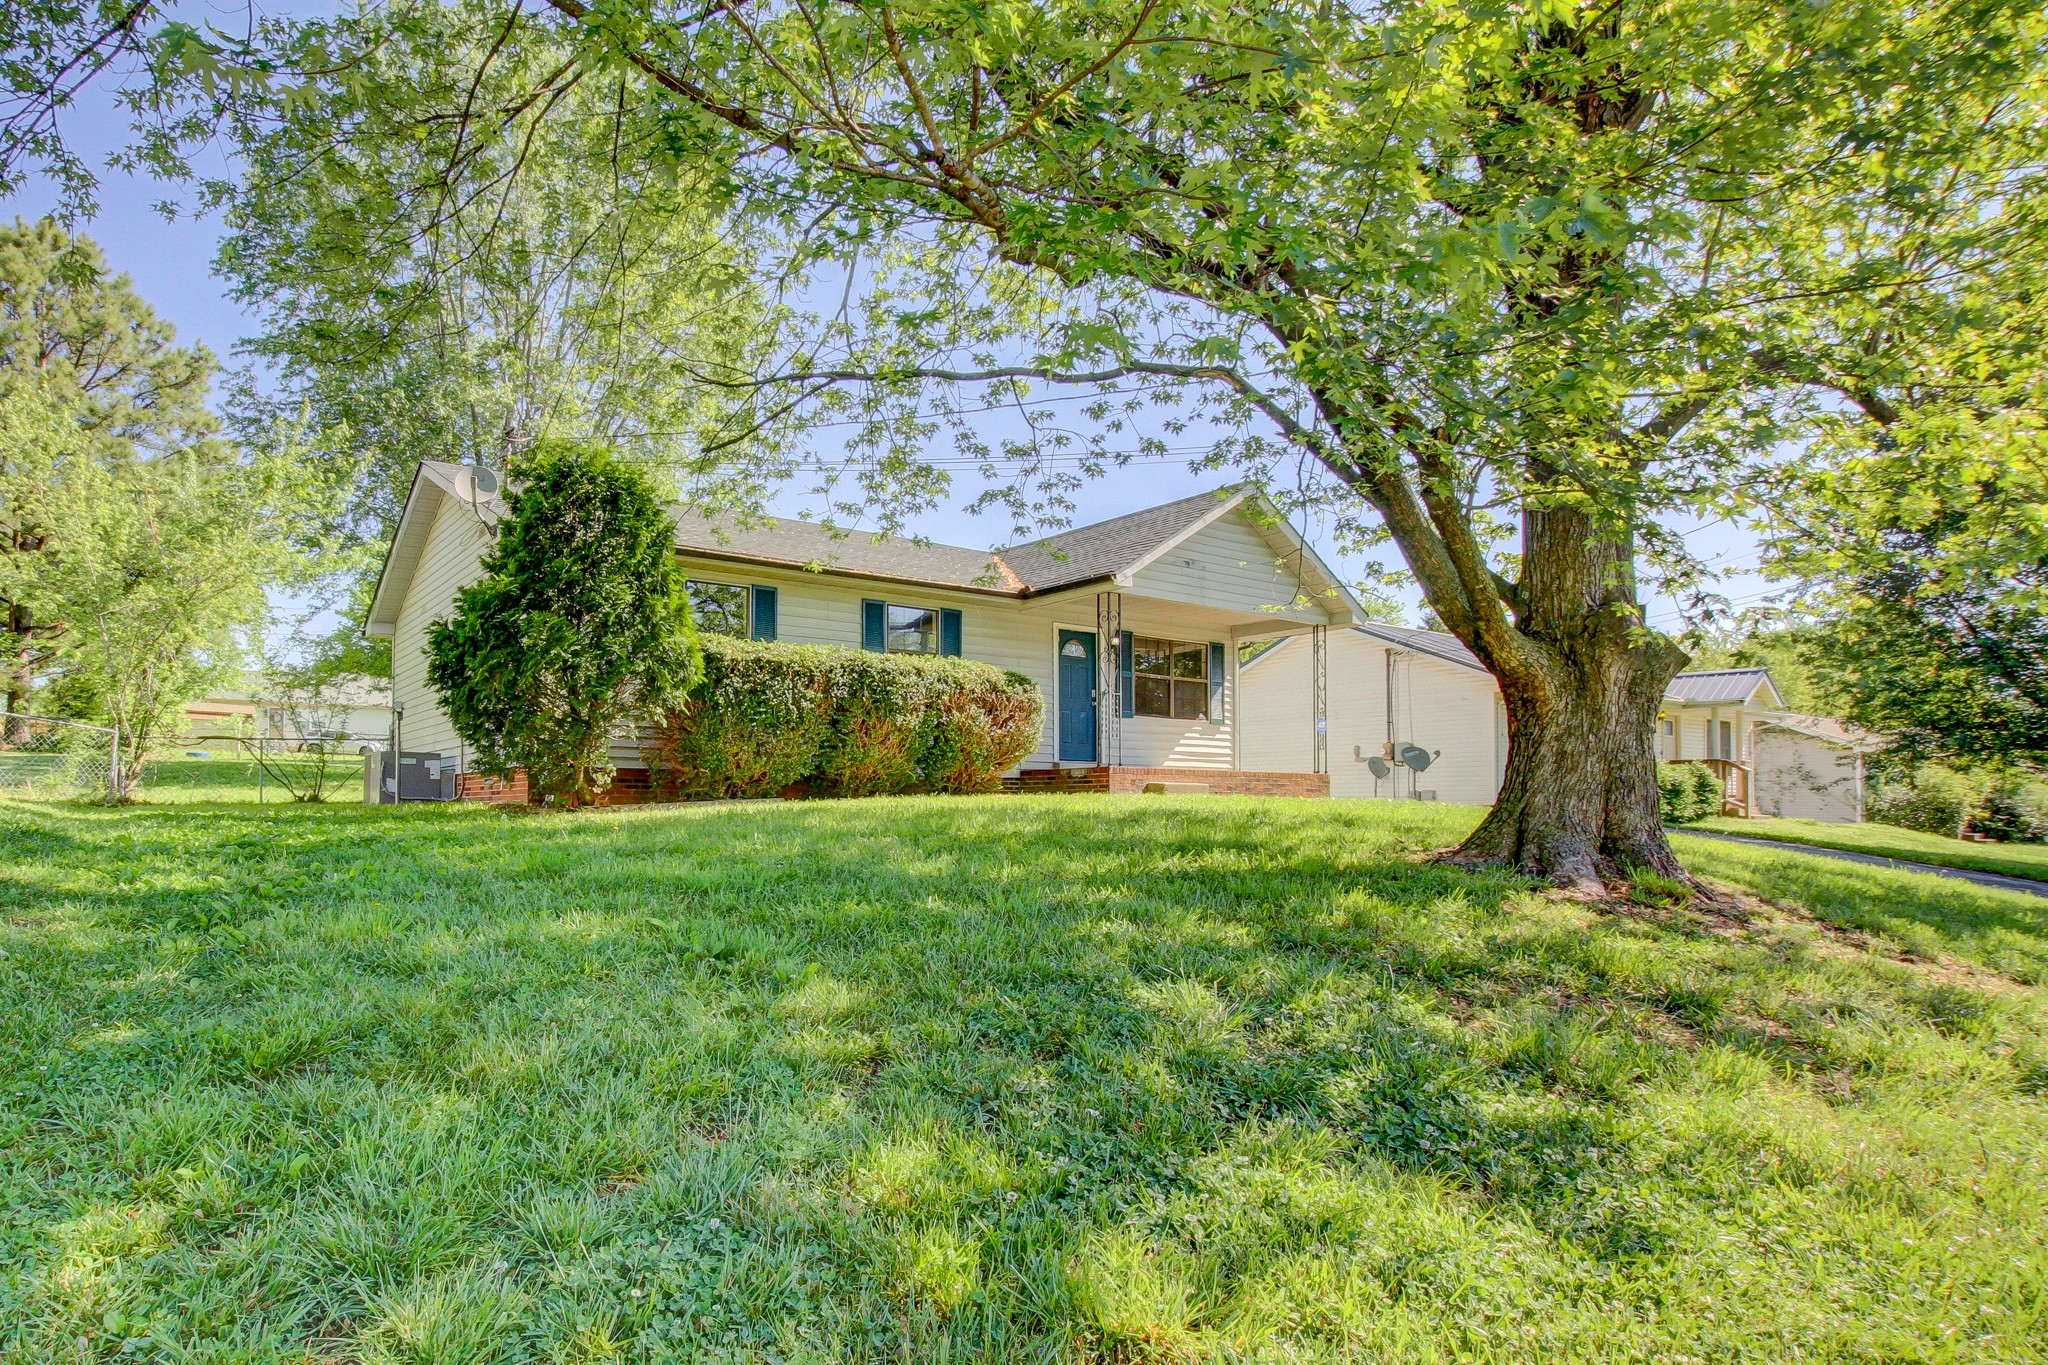 215 Al Oerter Dr Property Photo - Clarksville, TN real estate listing